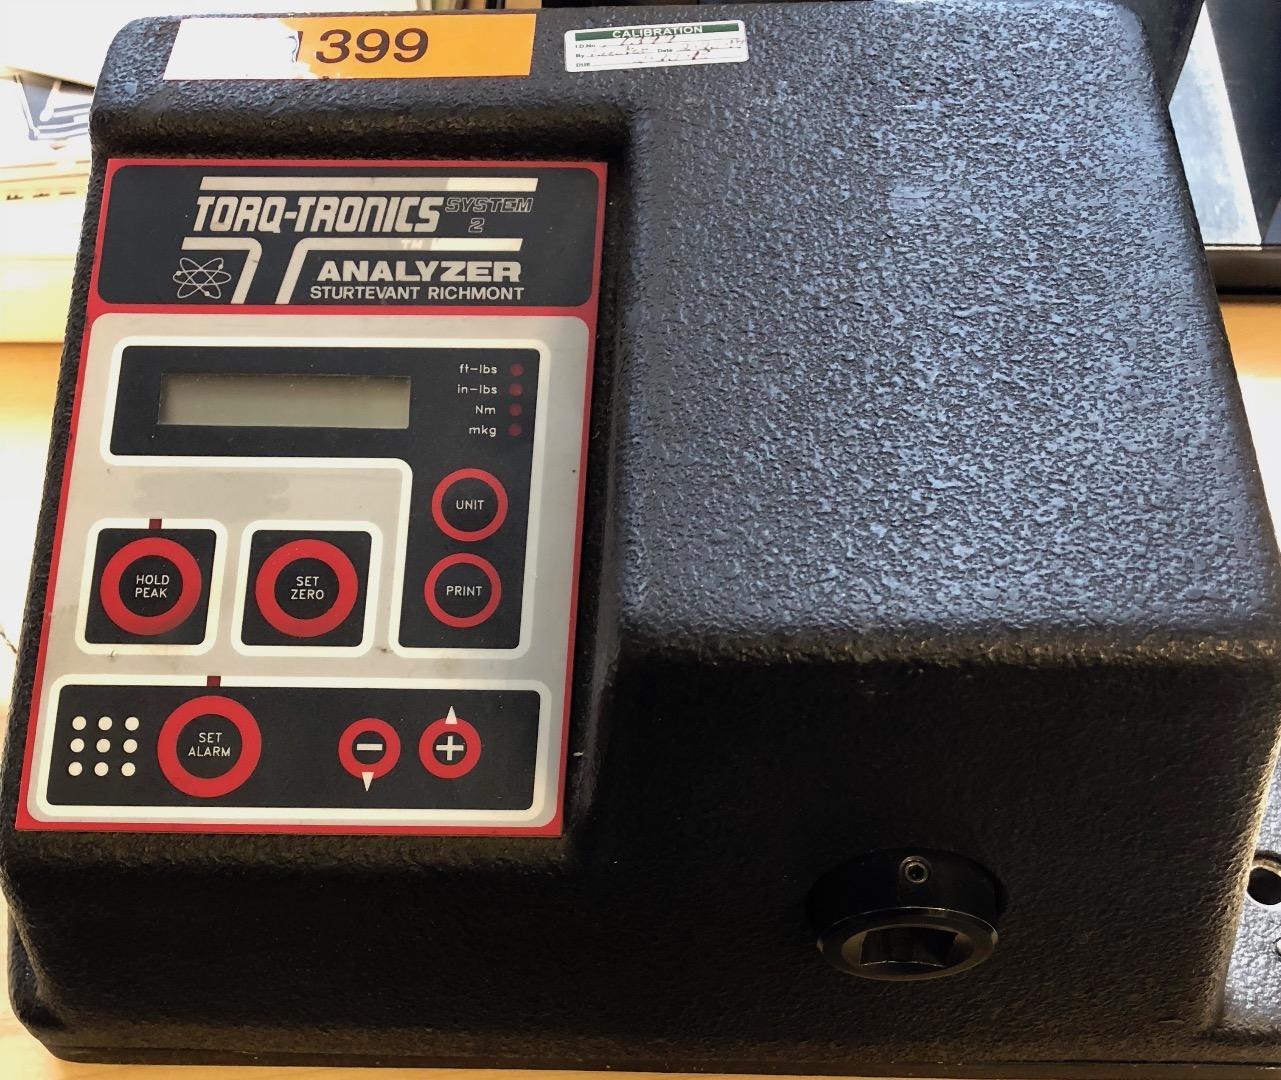 TorqTronics digital torque analyzer built in 1998